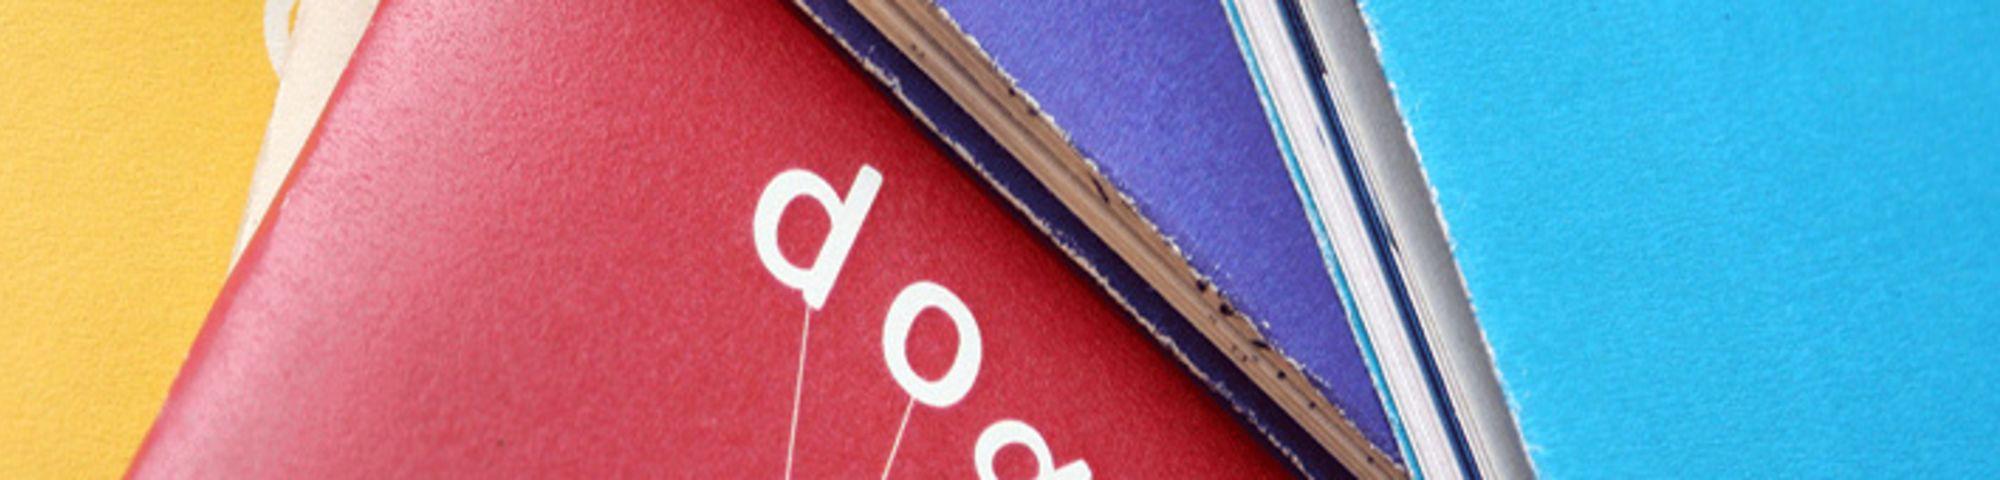 Mutli coloured book covers